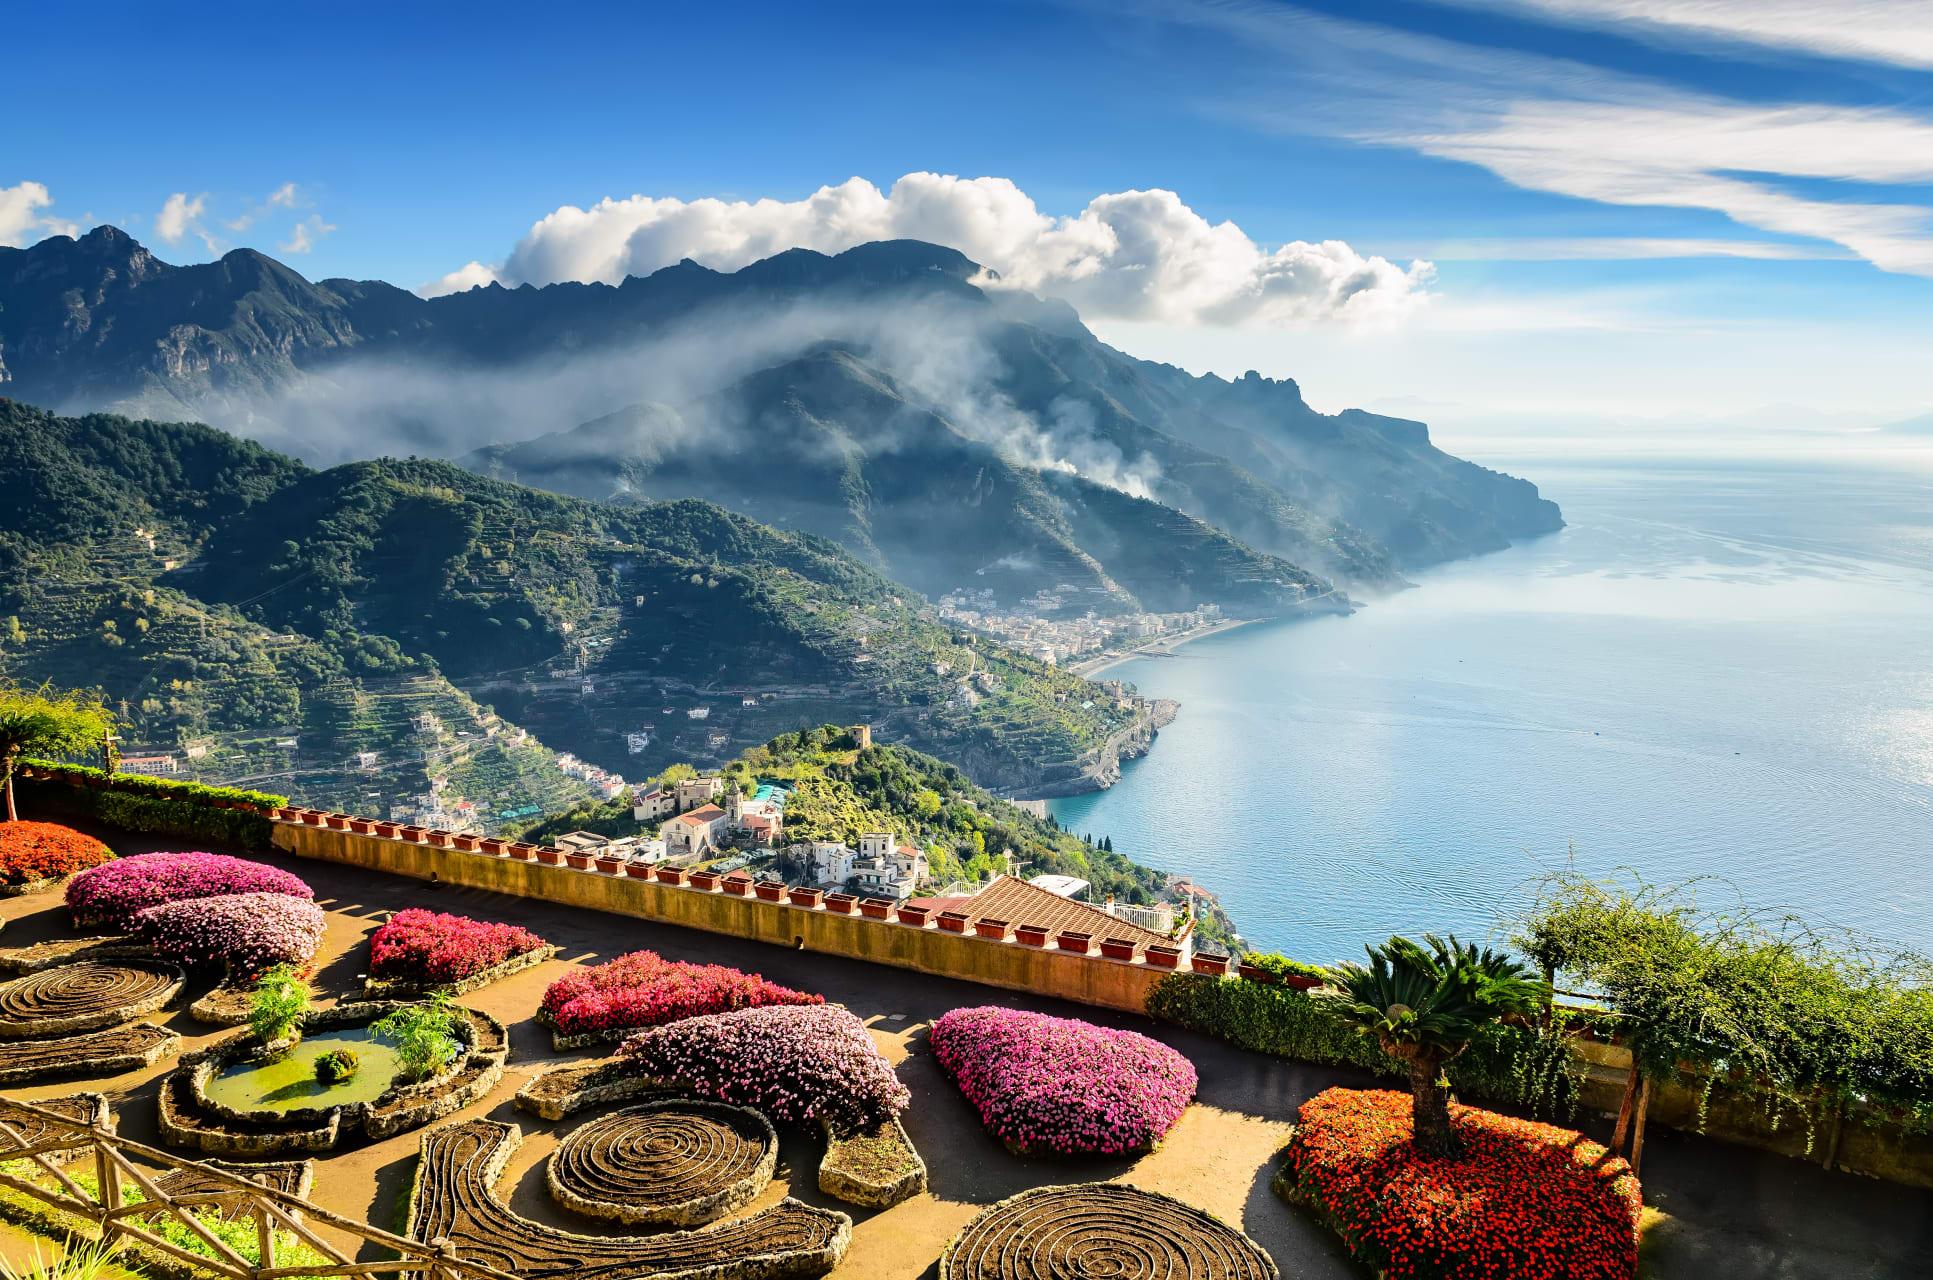 Amalfi Coast - Ravello at the Amalfi Coast: The Unesco City of Music